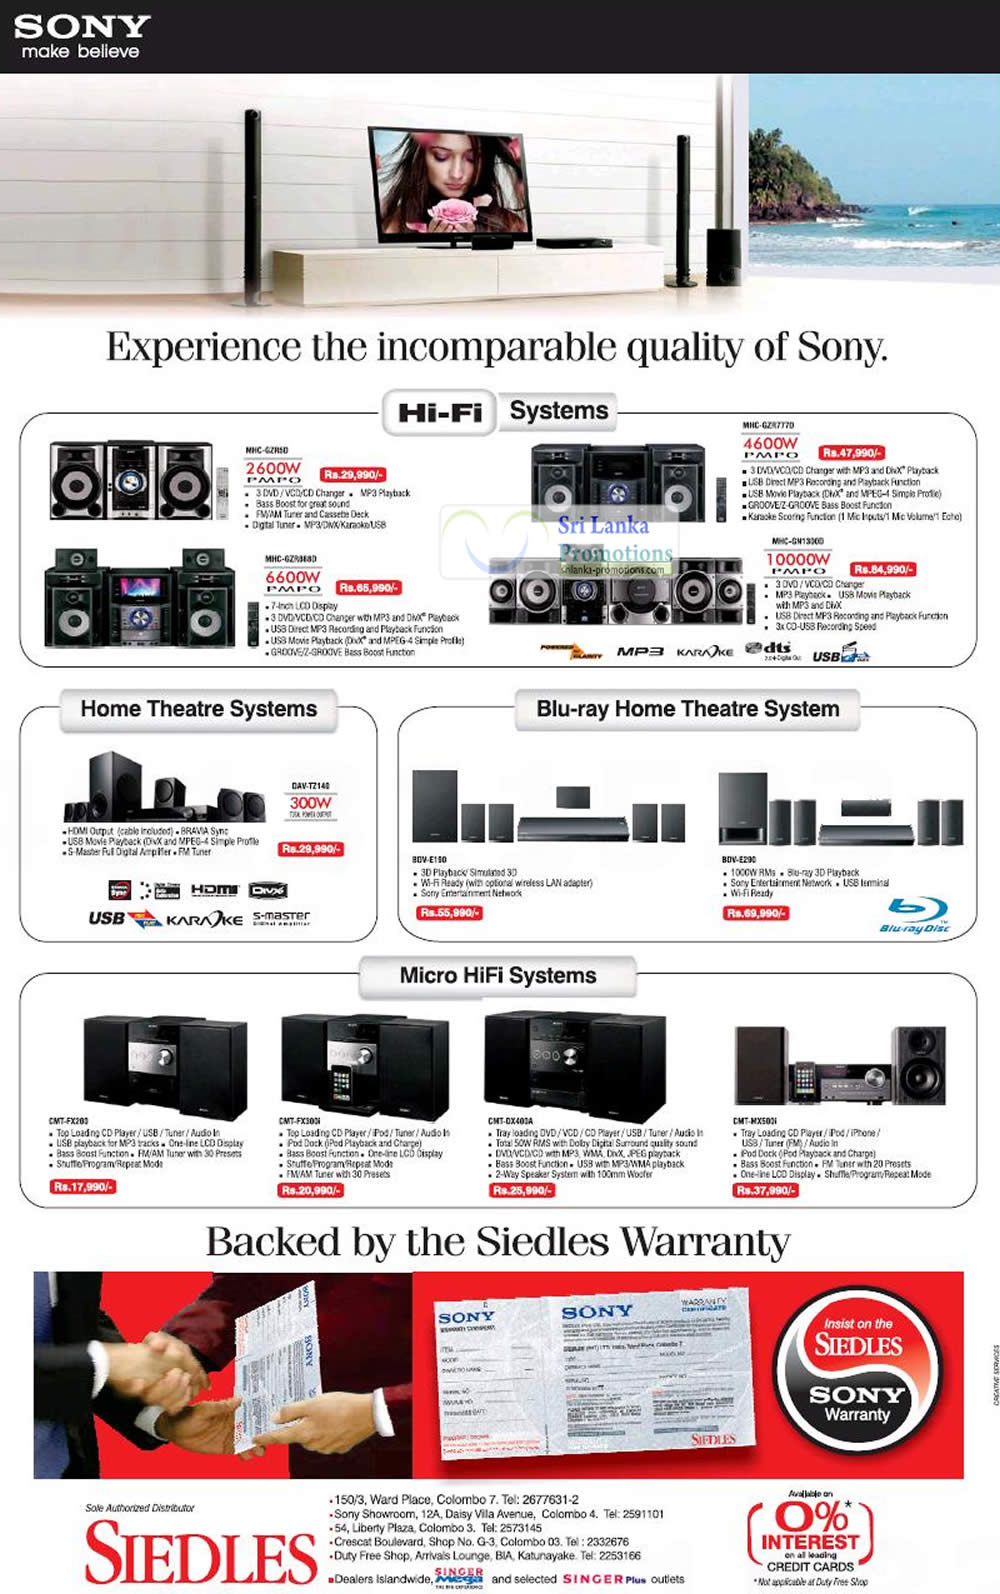 Sony 16 Sep 2012